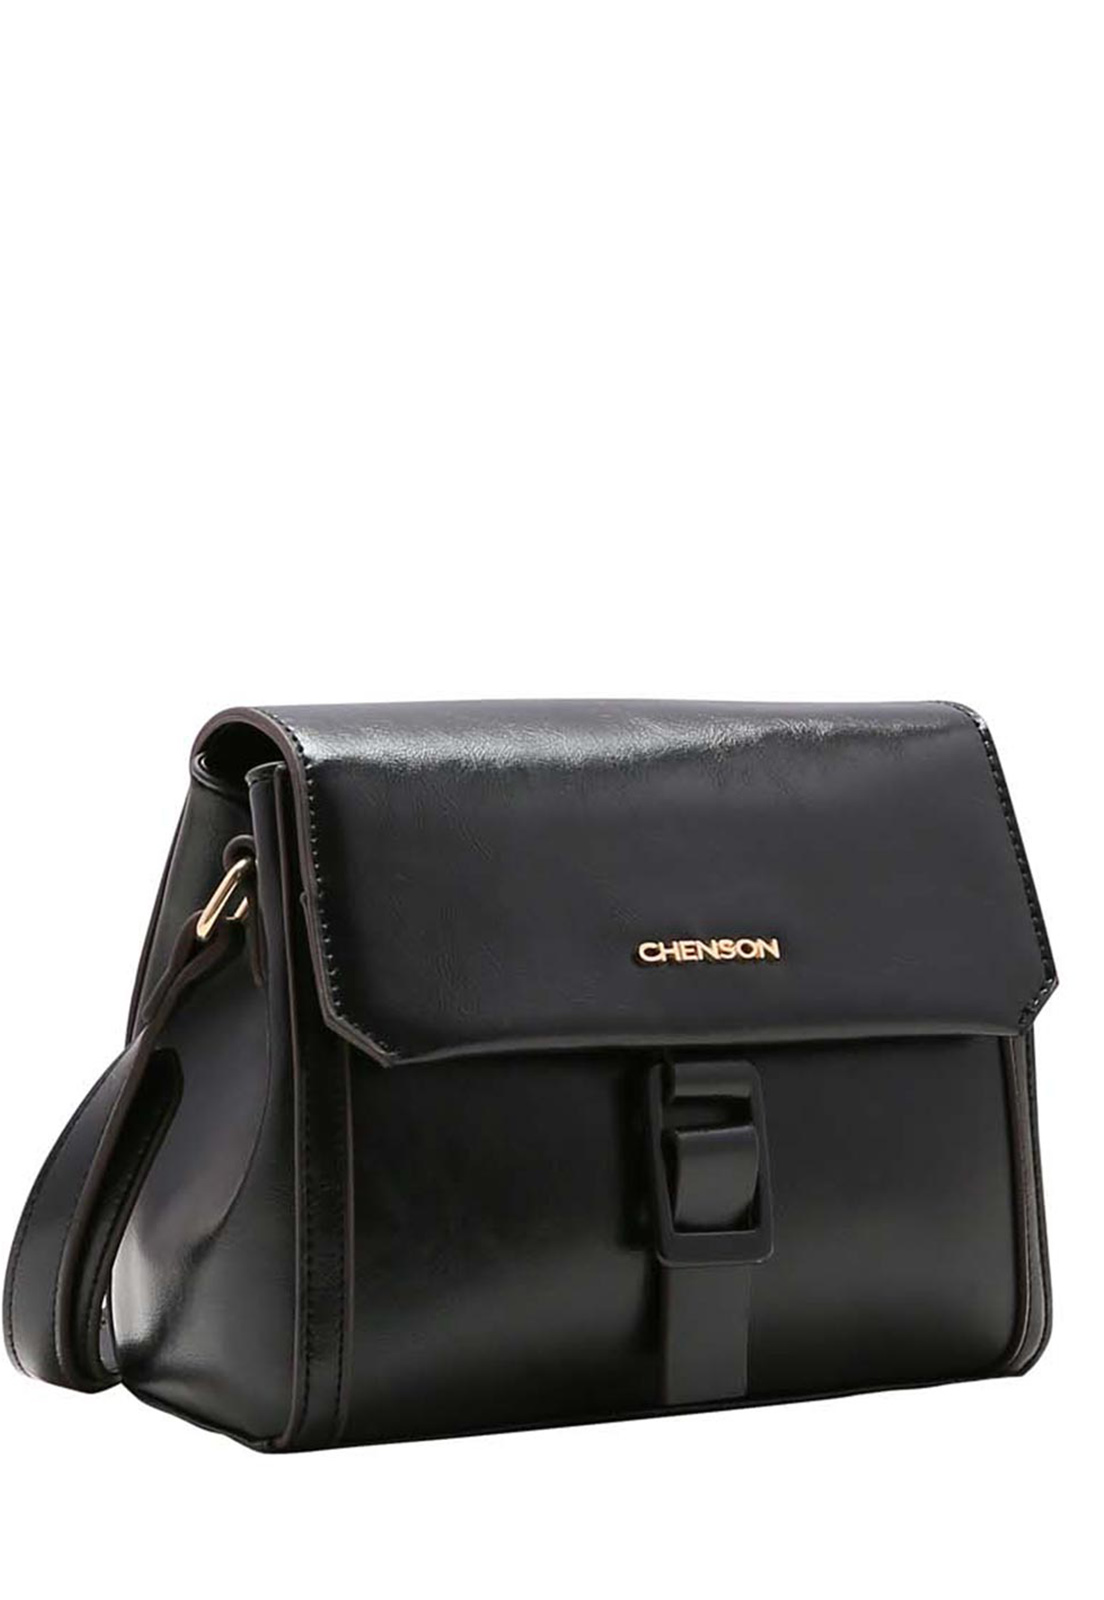 Bolsa Feminina Chenson Casual Fresh Transversal  3483431